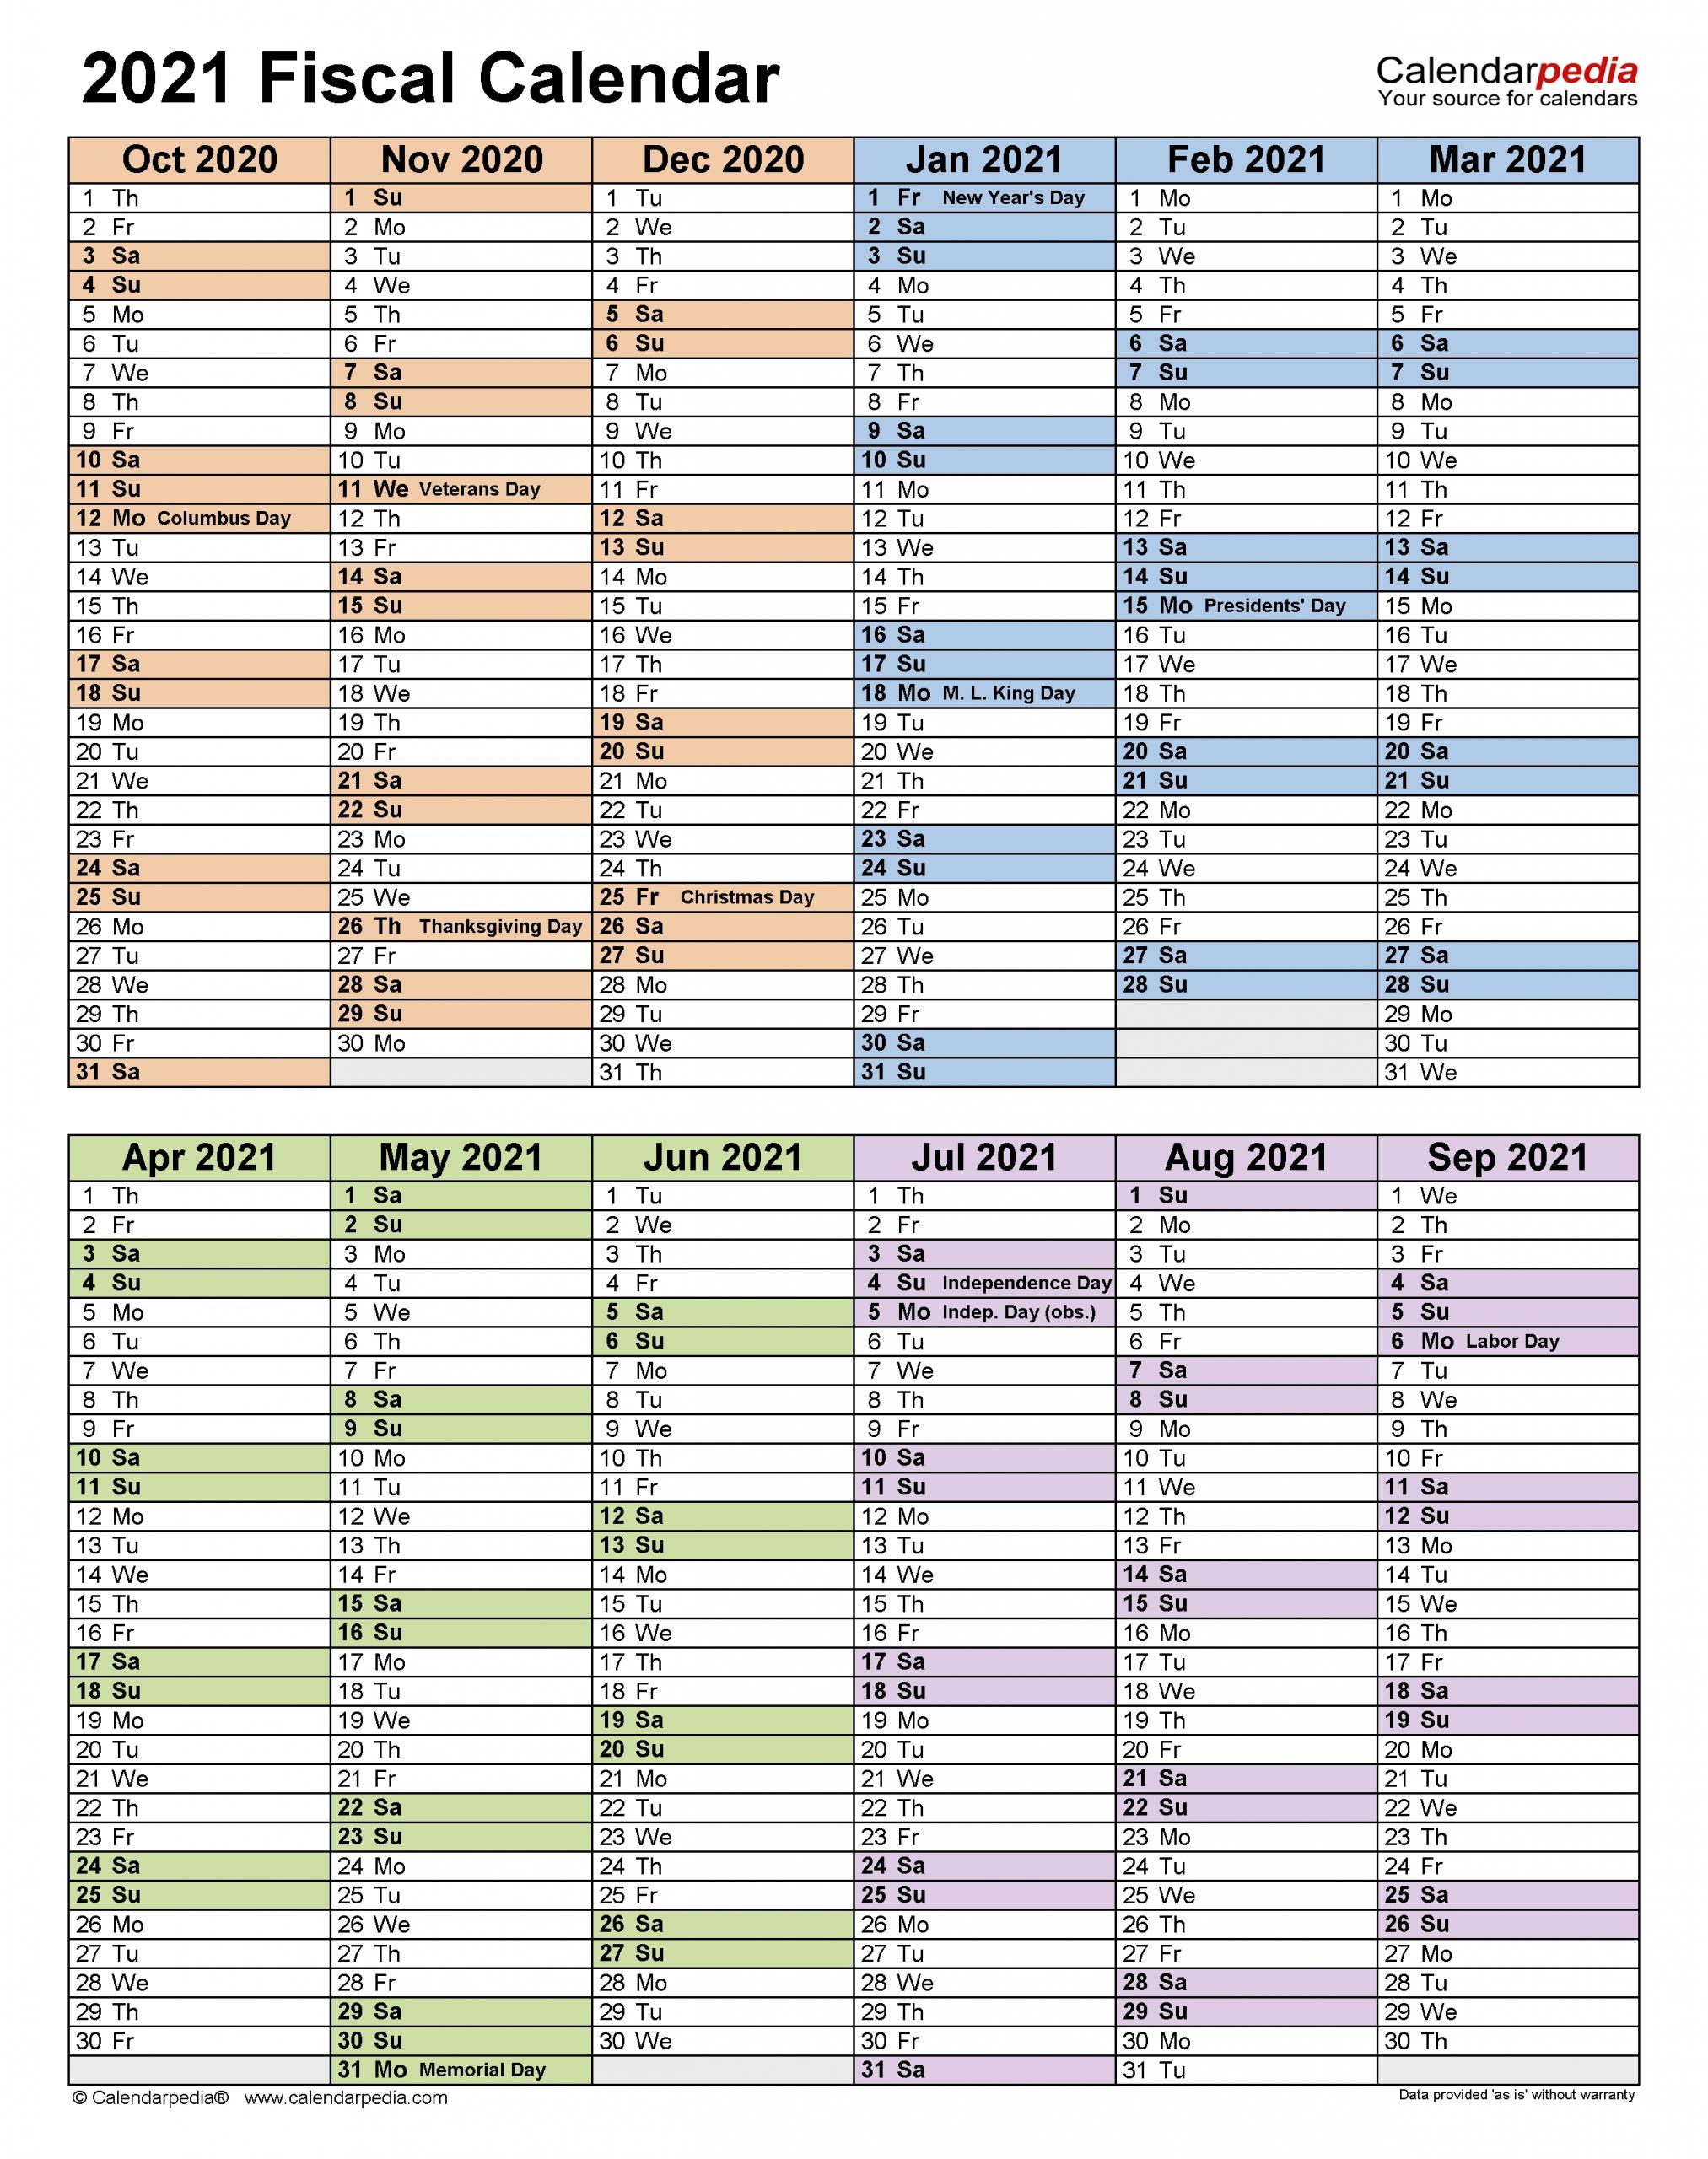 Fiscal Calendars 2021 - Free Printable Excel Templates  Calendar 2021 2021 Financial Year